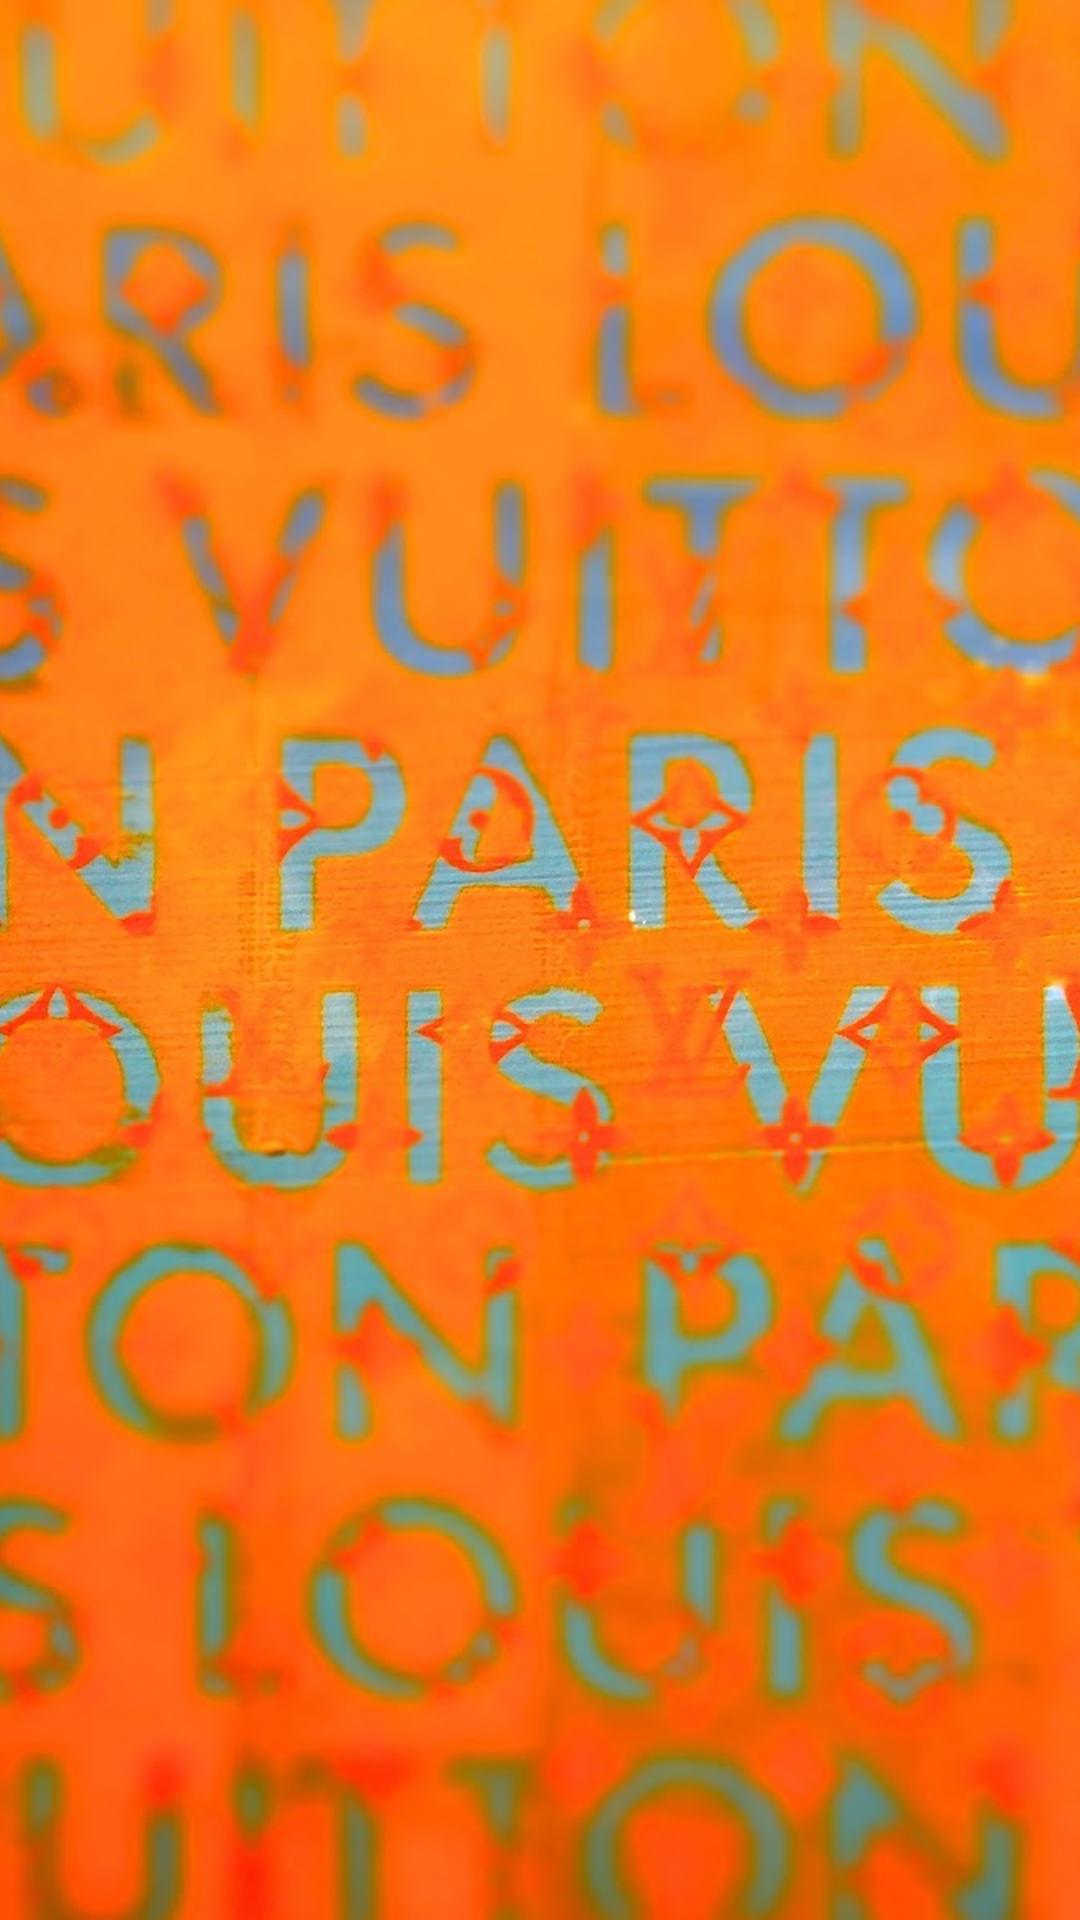 louisvuitton i10 - LOUIS VUITTON[ルイ・ヴィトン]の高画質スマホ壁紙20枚